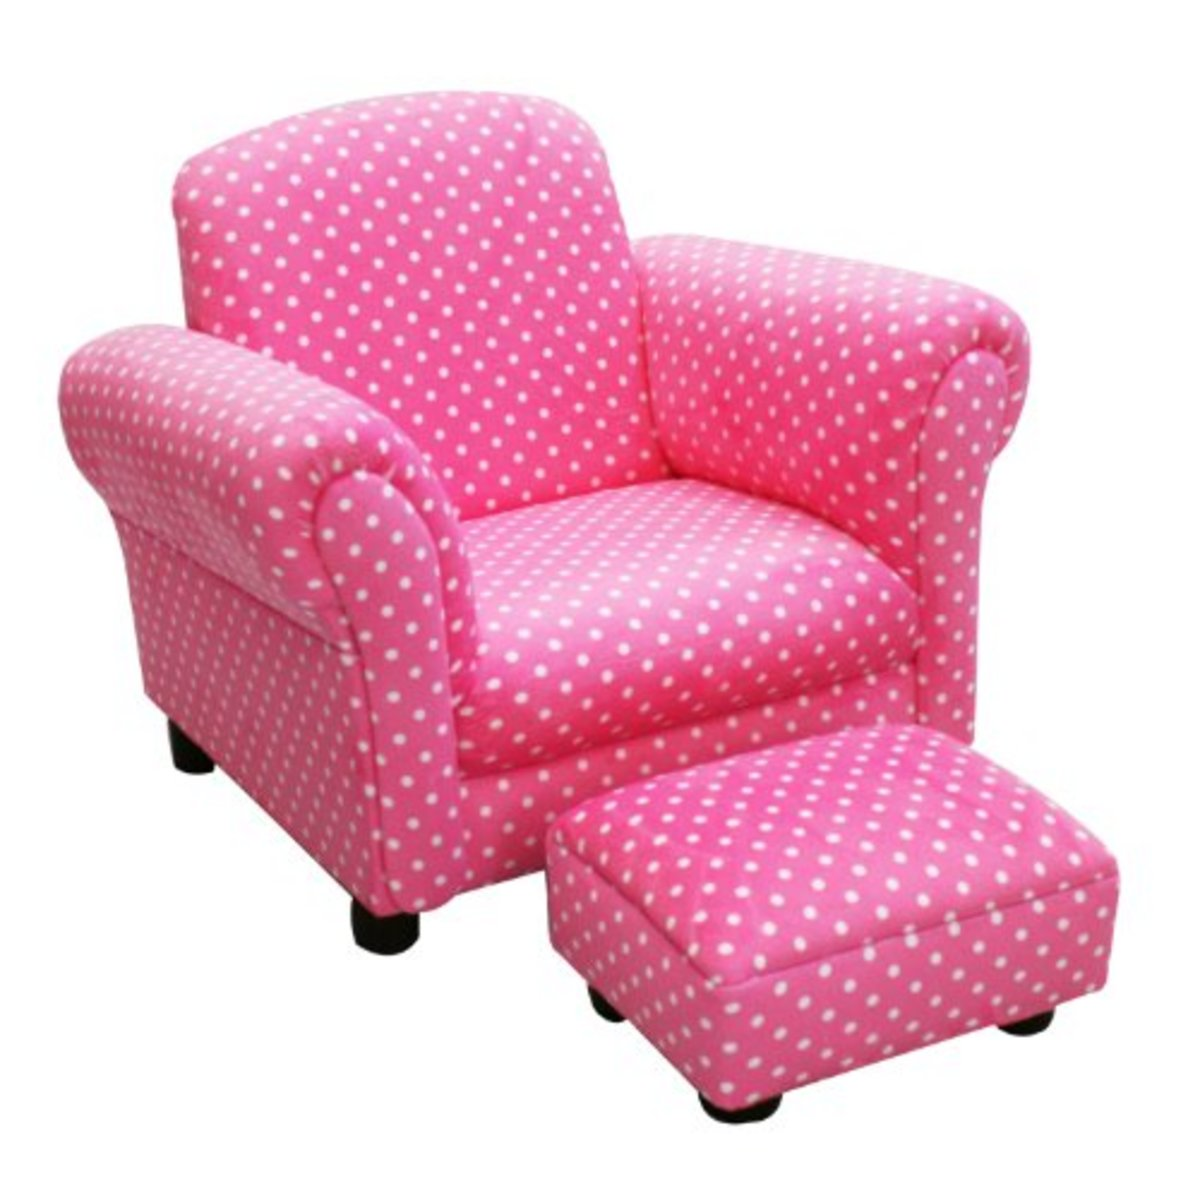 Little Girls' Pink Polka Dot Upholstered Chair and Ottoman Set